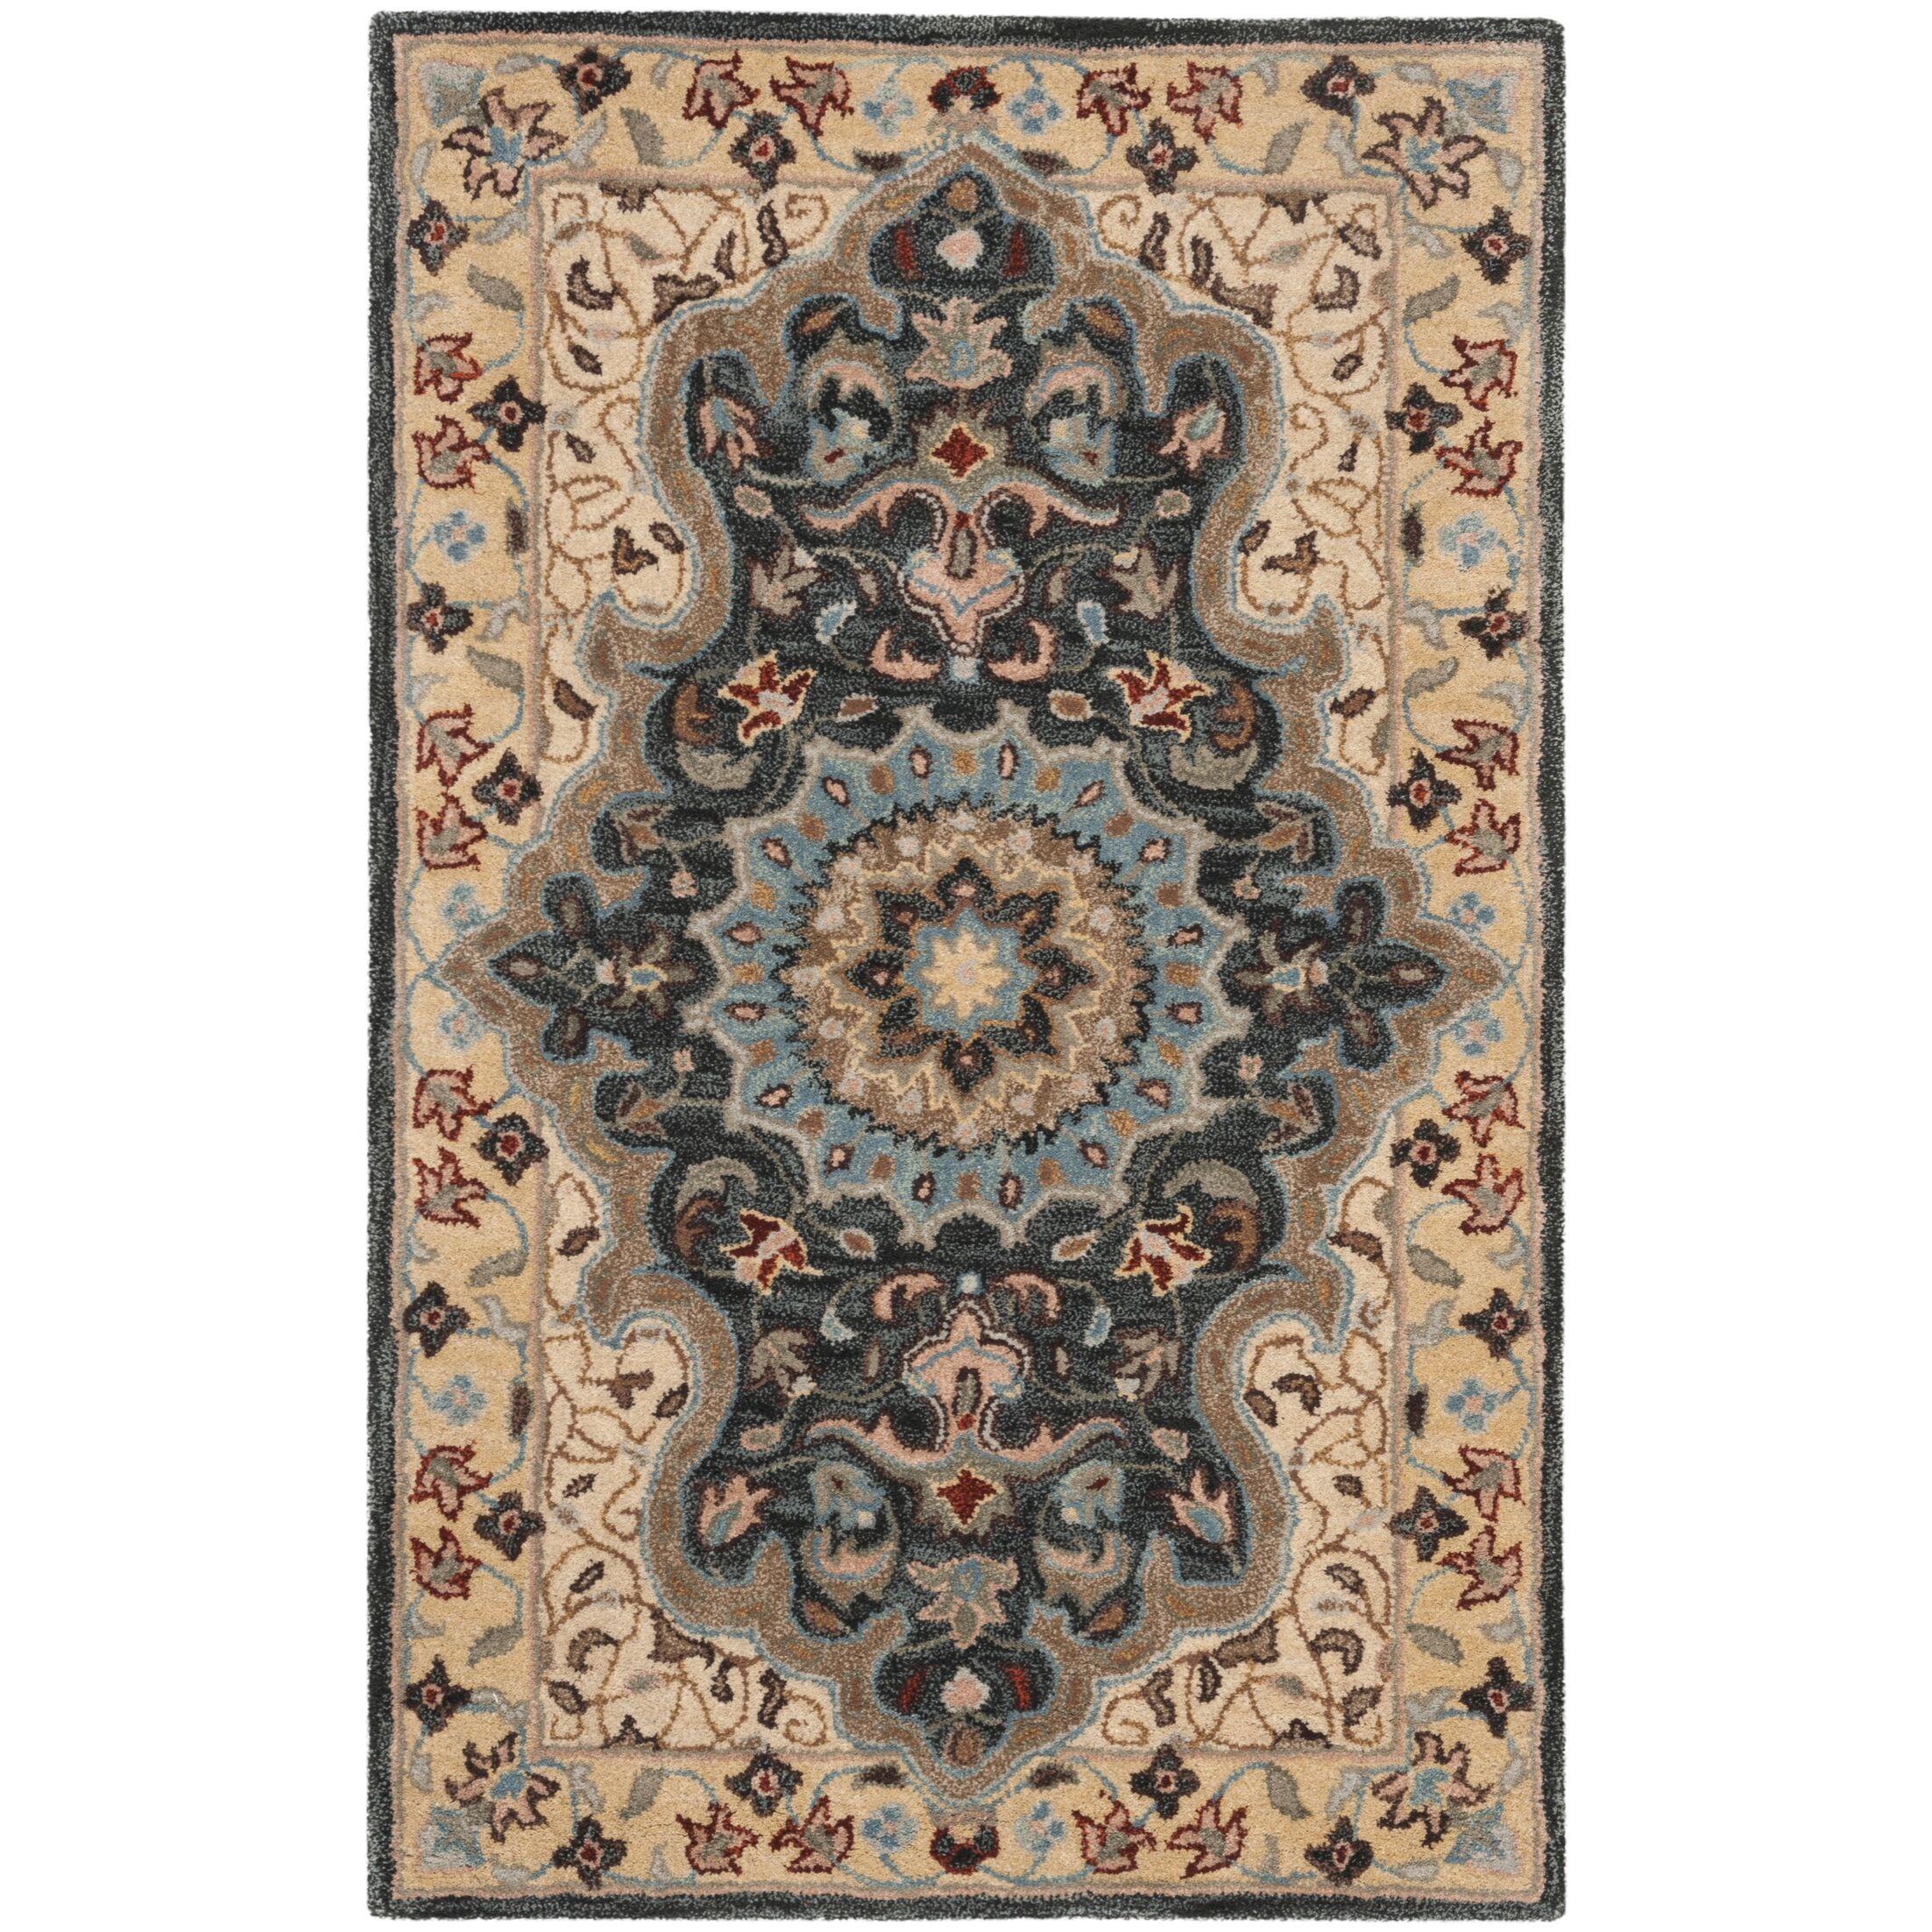 Kuhlman Hand-Woven Wool Cream/Black Area Rug Rug Size: Rectangular 4' x 6'